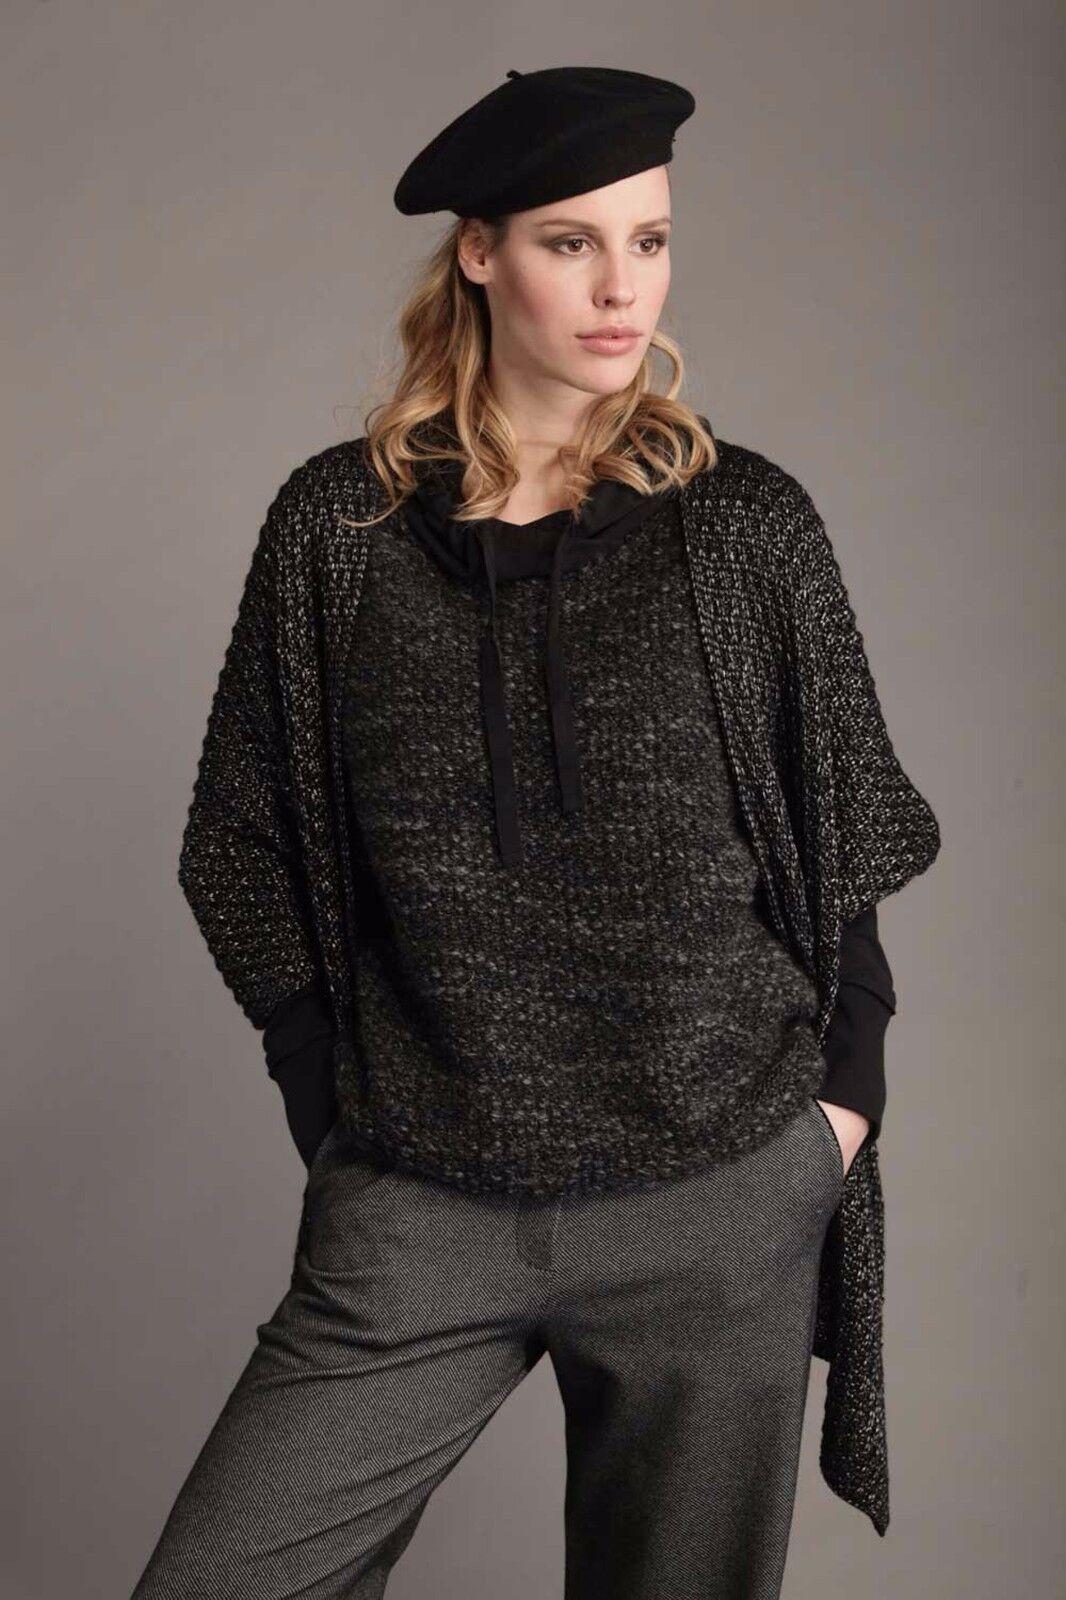 811d0505af ... Felpa da donna nera Deha con cappuccio manica lunga lunga lunga casual  cotone lana moda 5bf31e